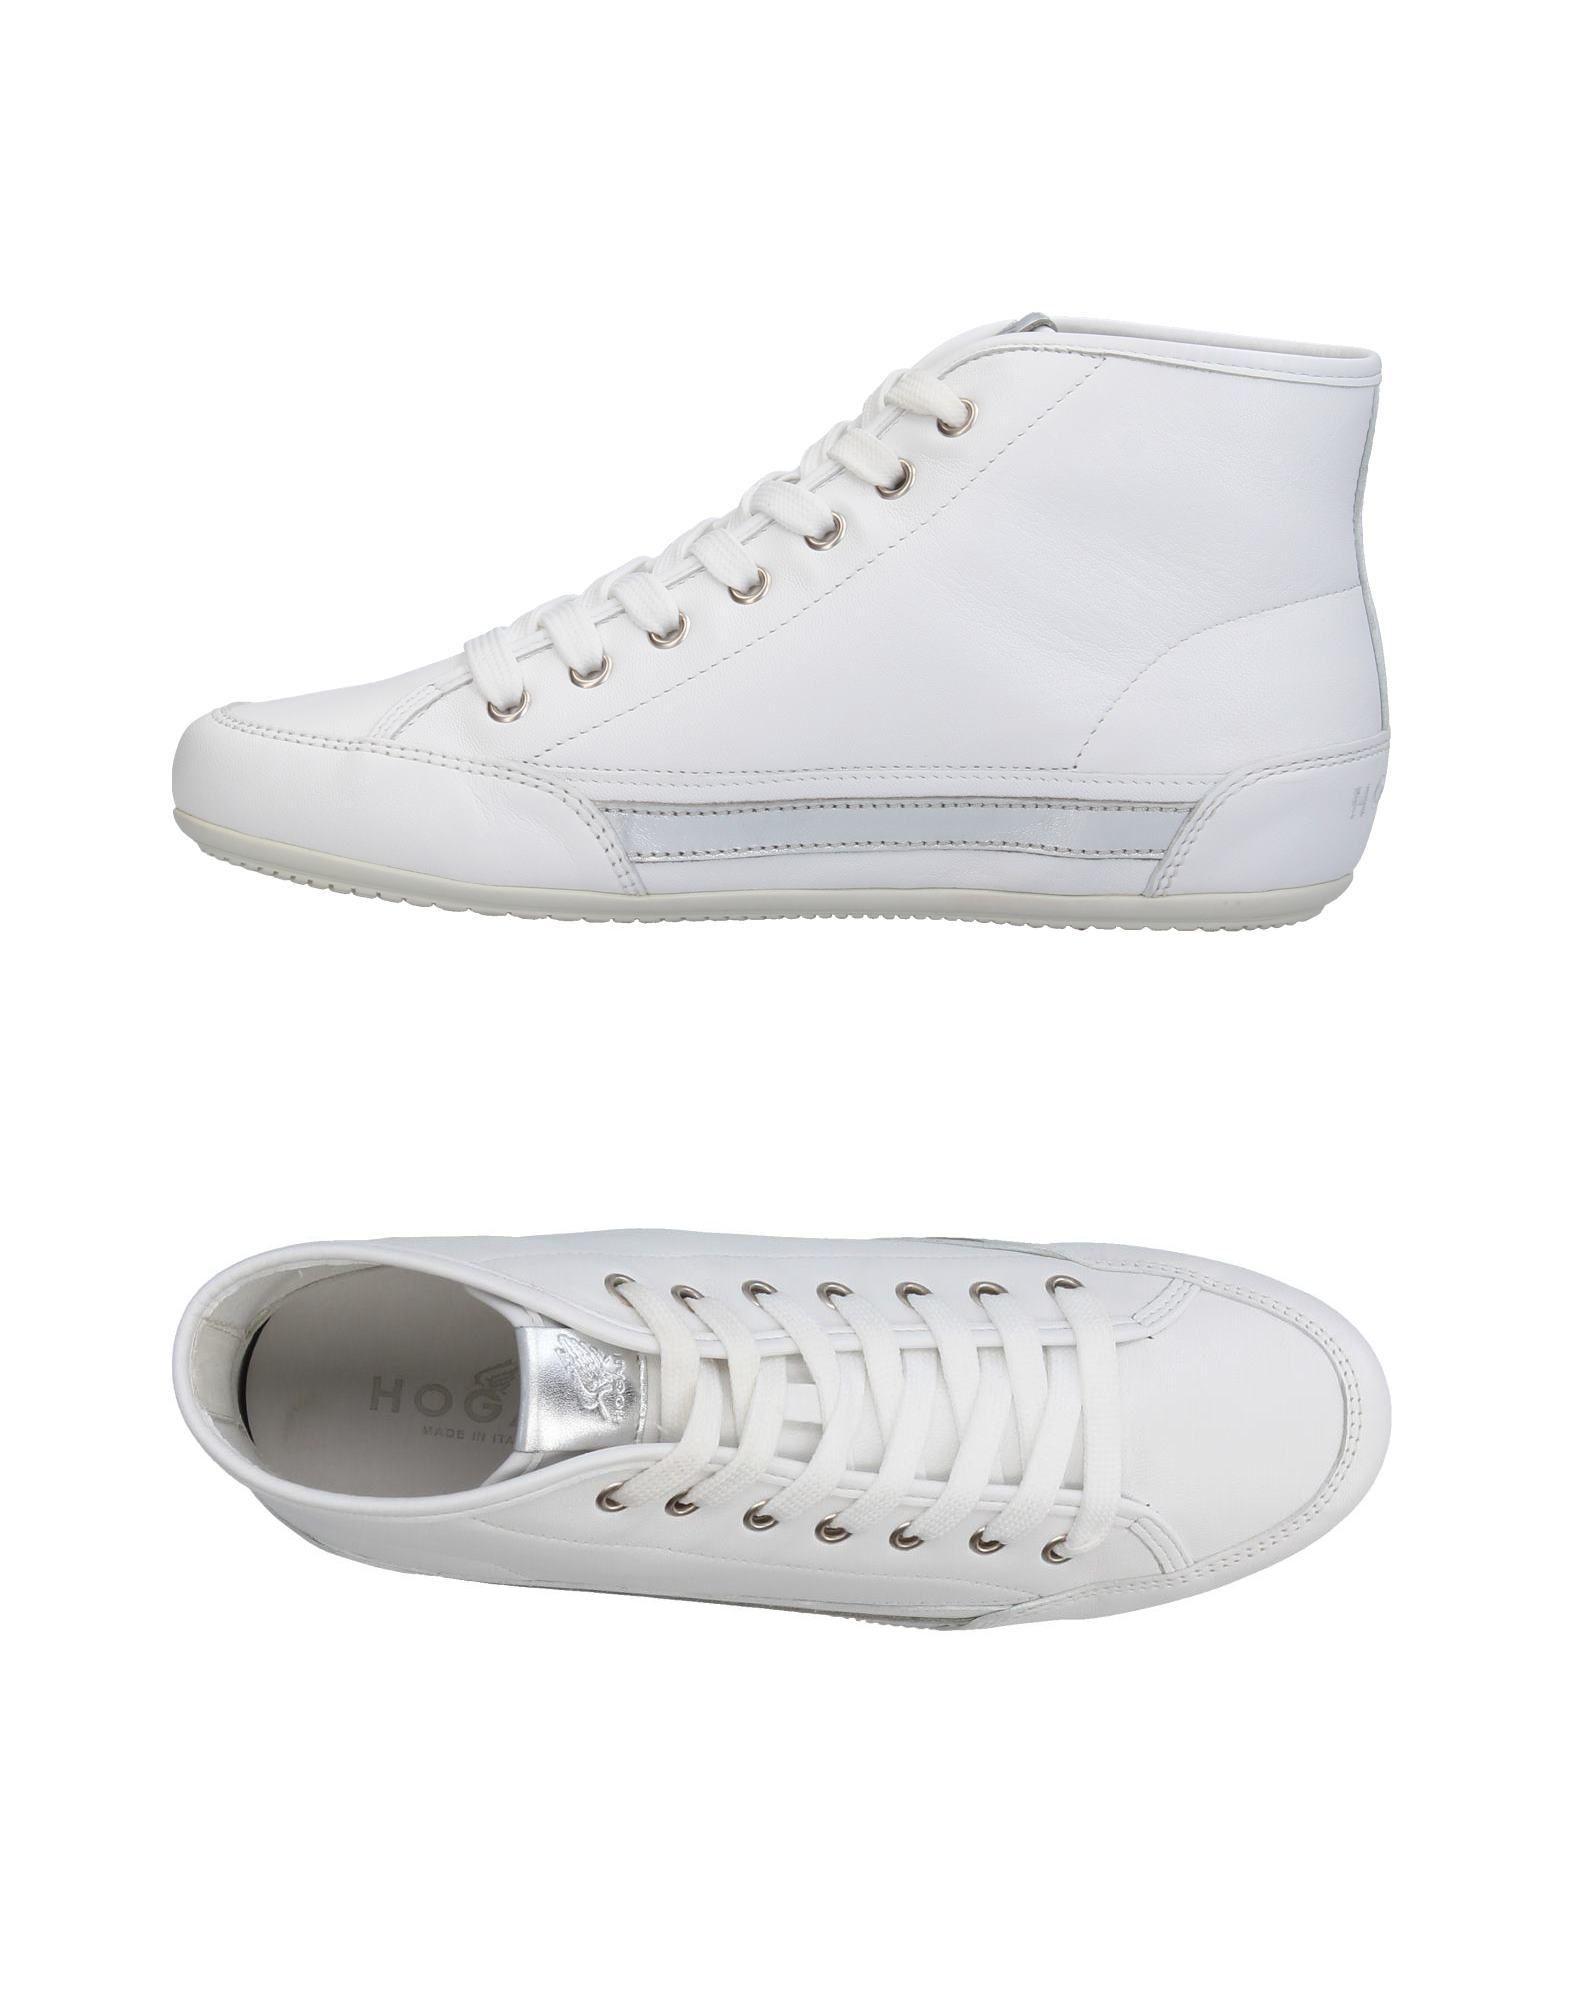 A buon mercato Sneakers Hogan Donna - 11040583CW